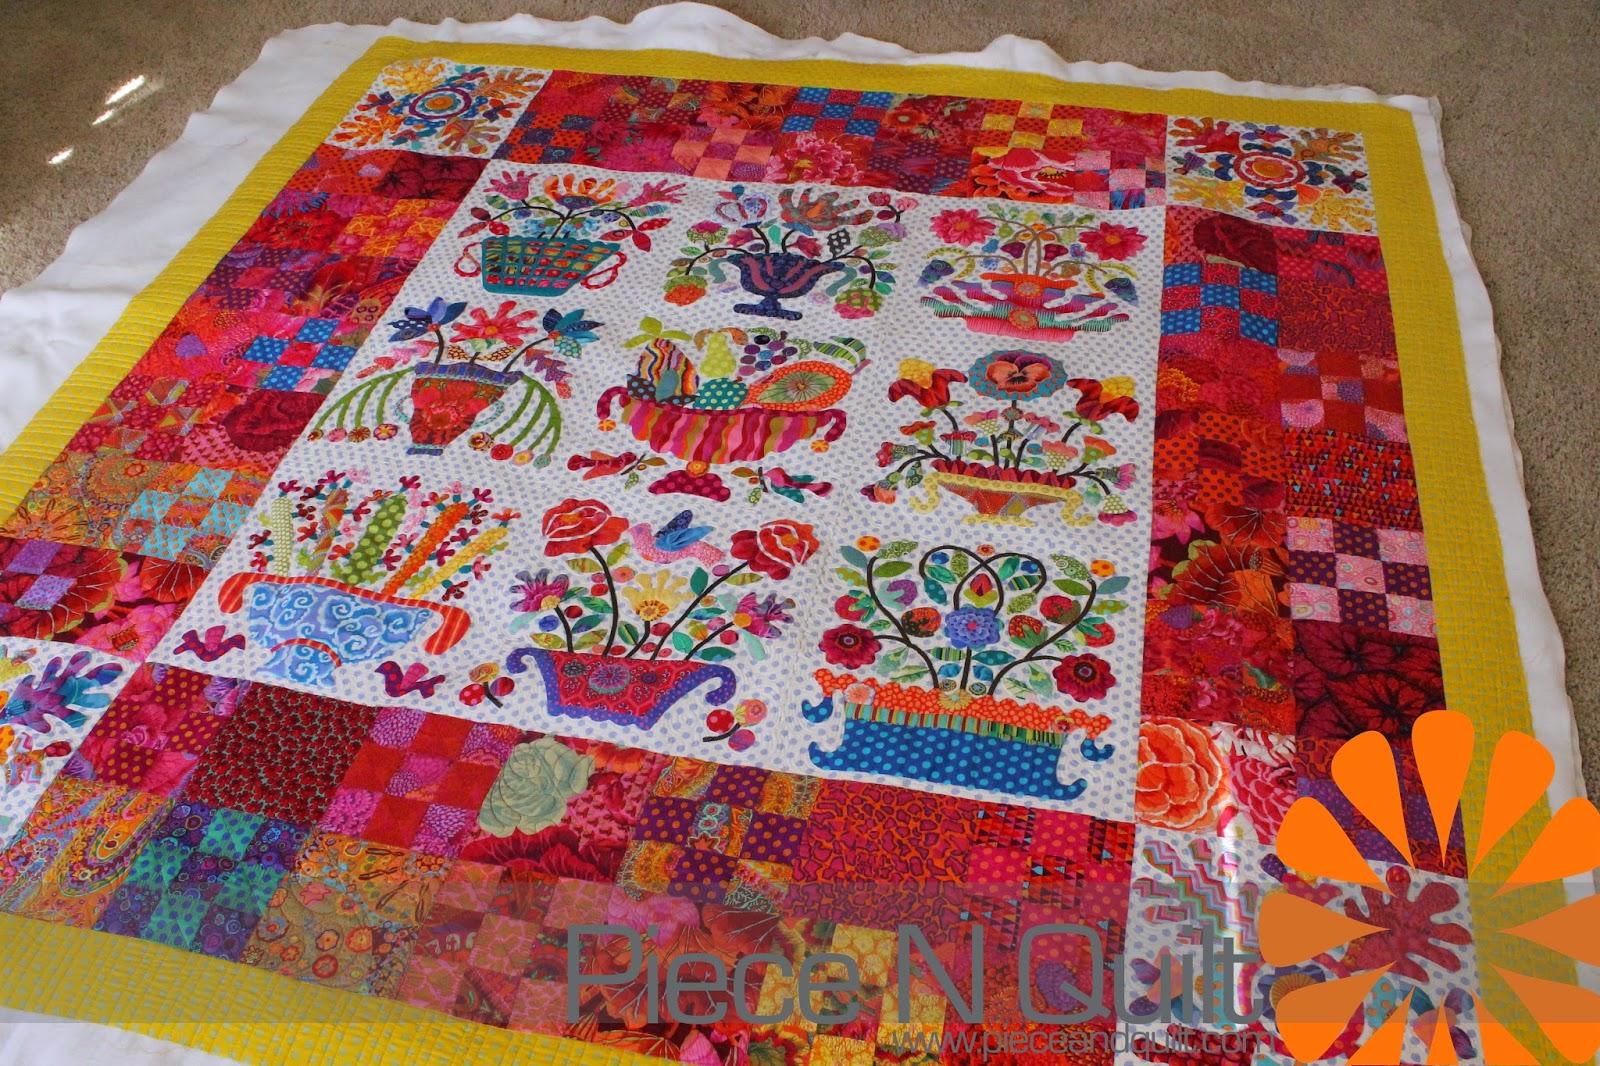 Piece n quilt: free motion quilting an applique quilt